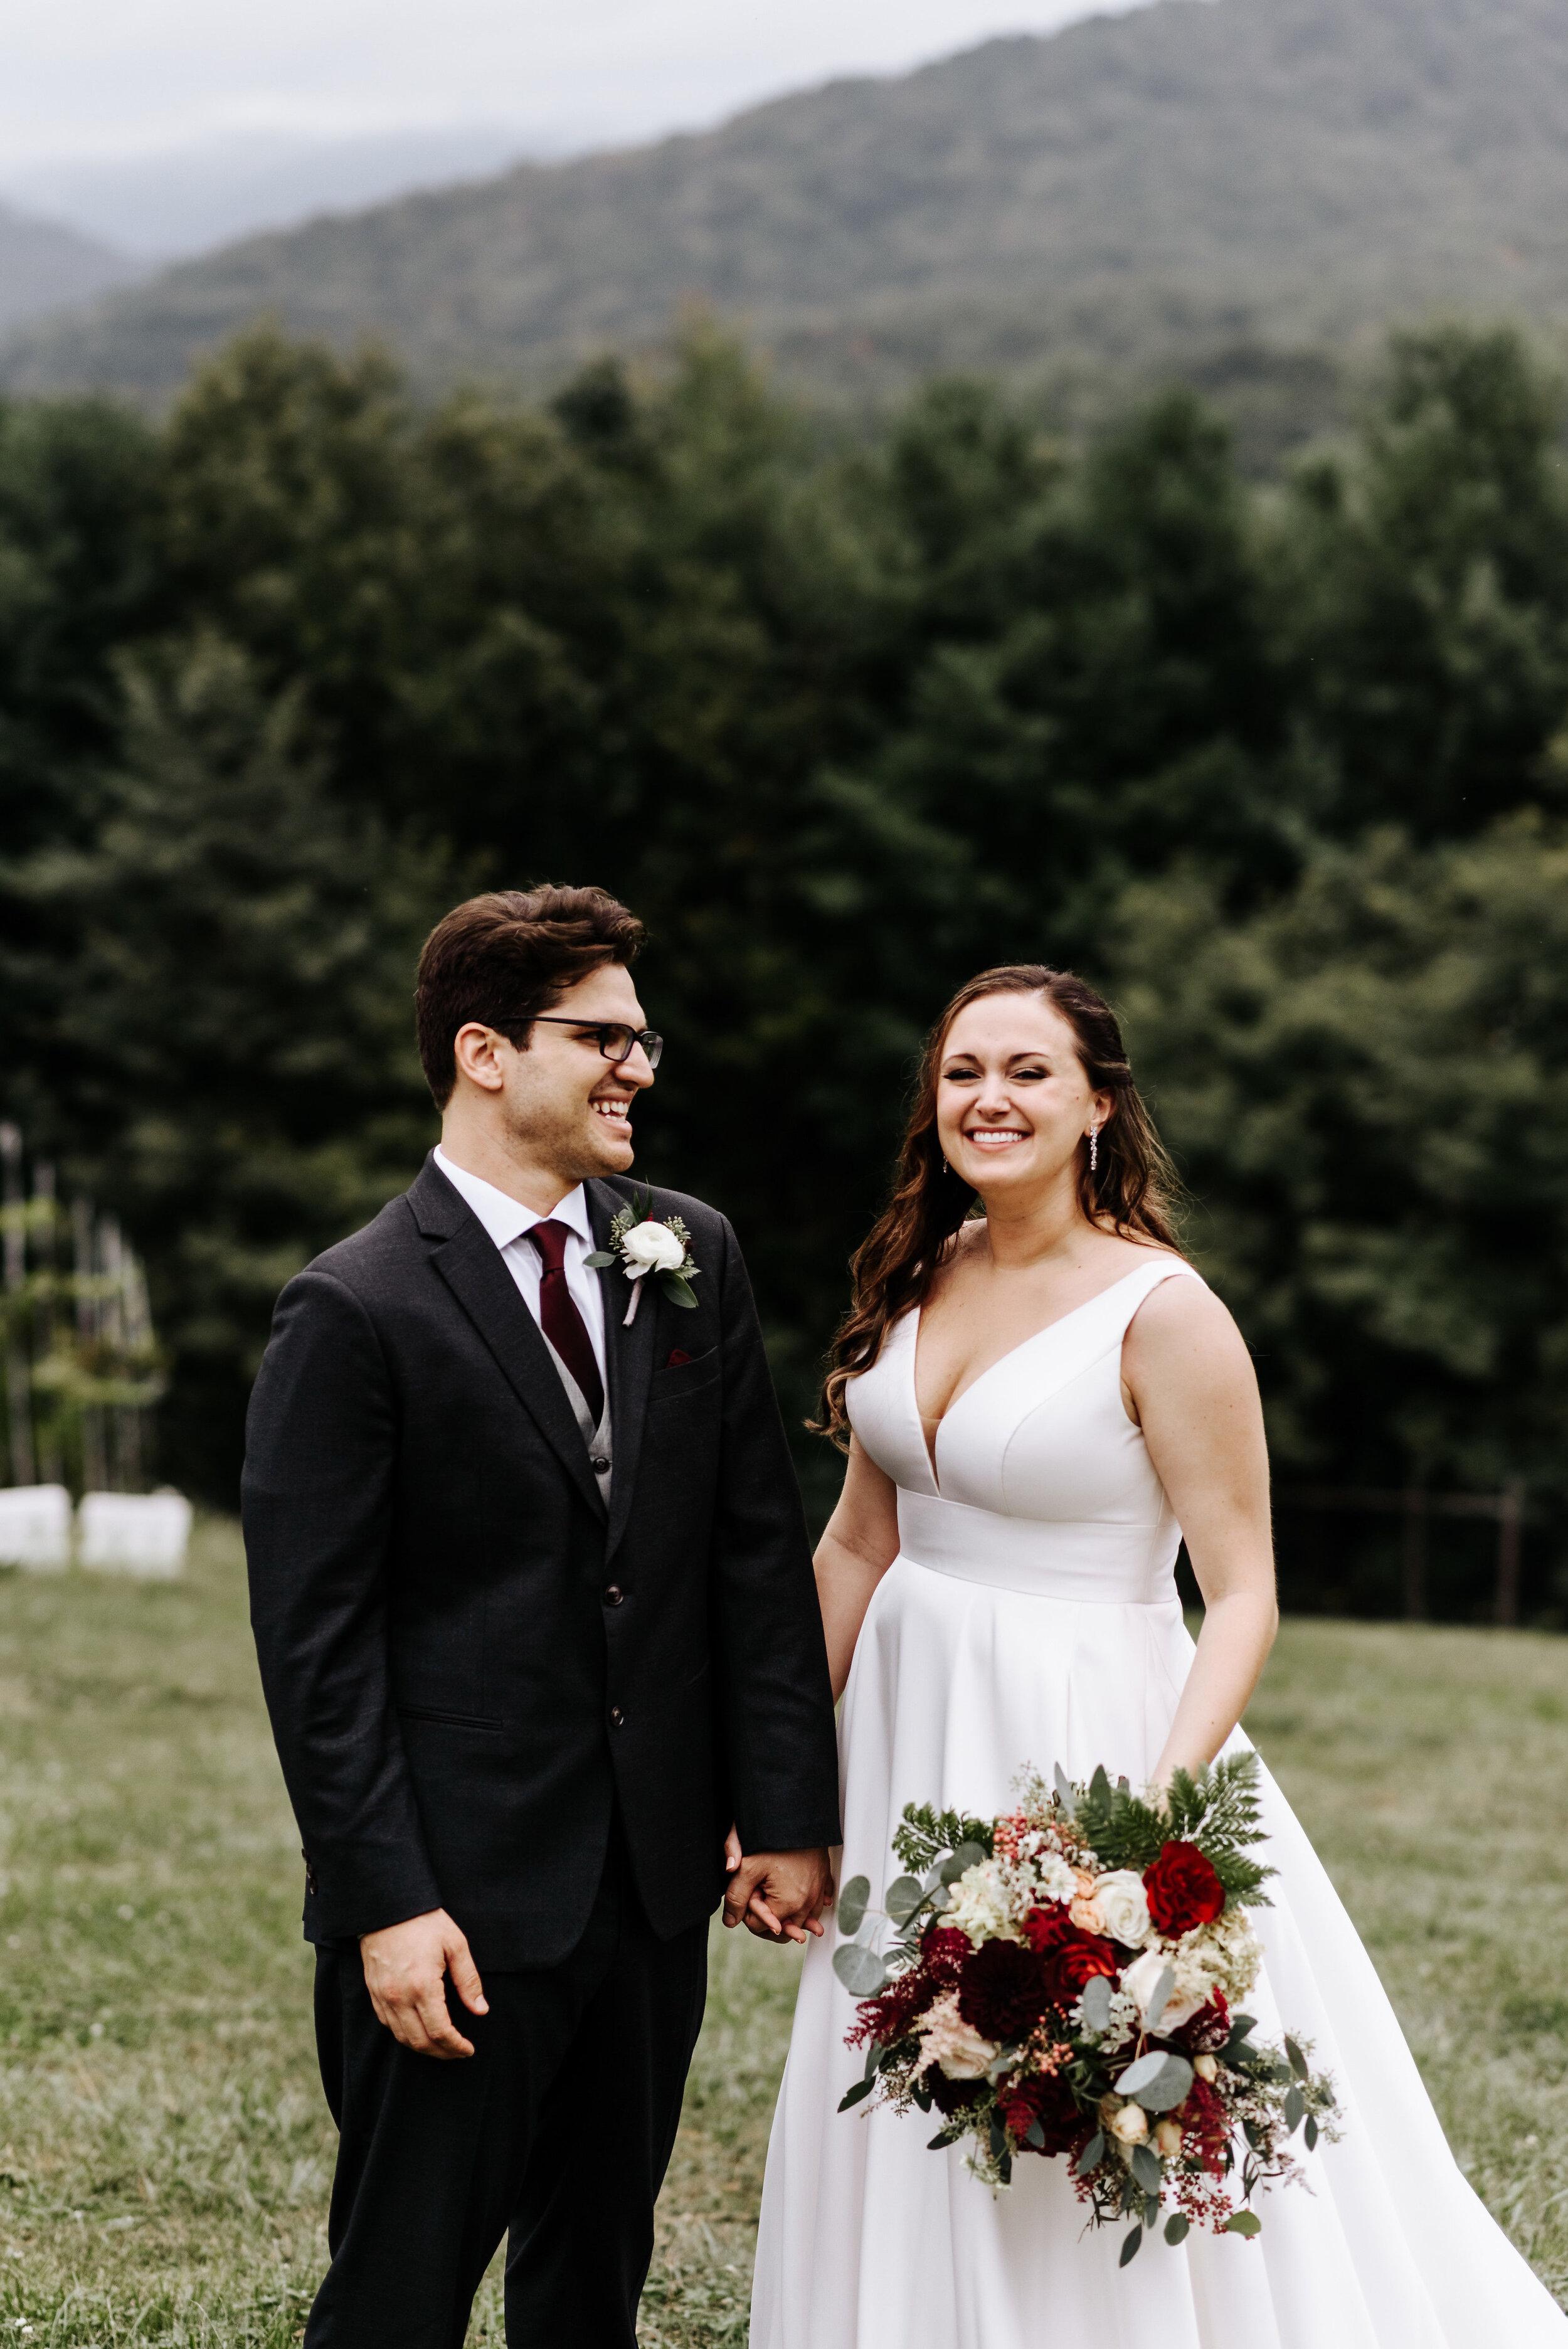 Allison_Nolan_Moss_Vineyards_Wedding_Charlottesville_Virginia_Photography_by_V_33.jpg